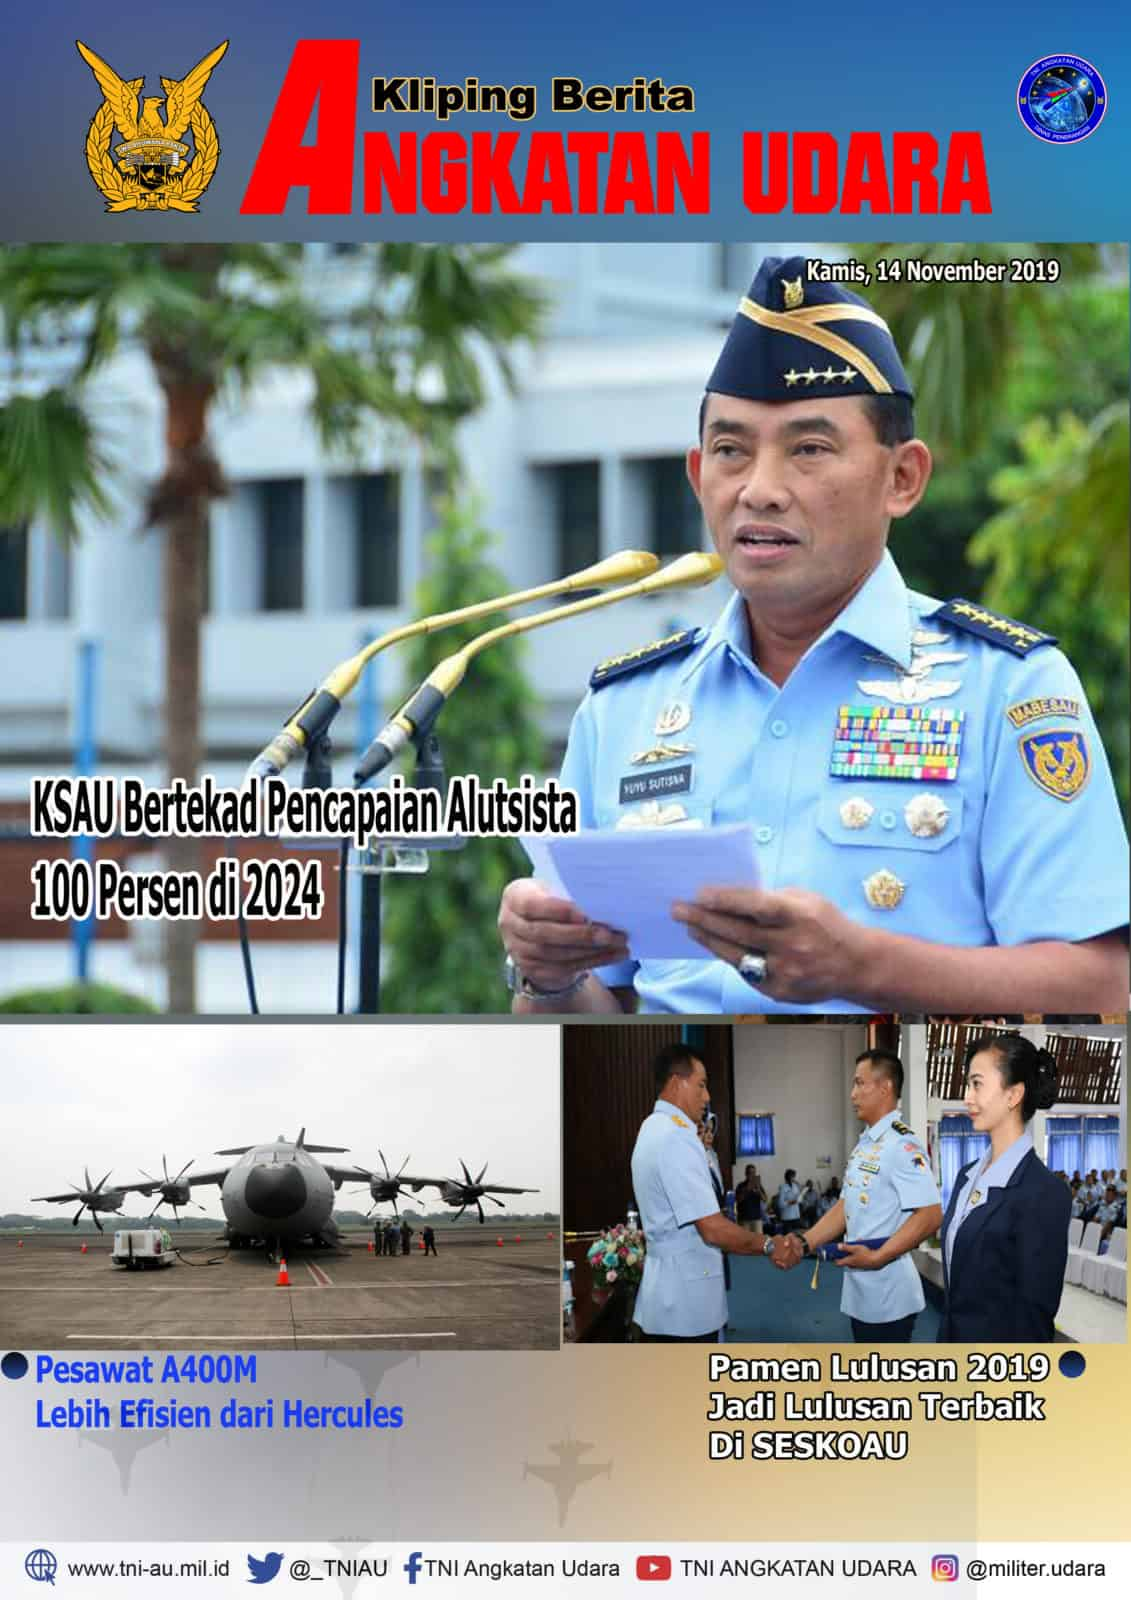 Kliping Berita Media 14 November 2019